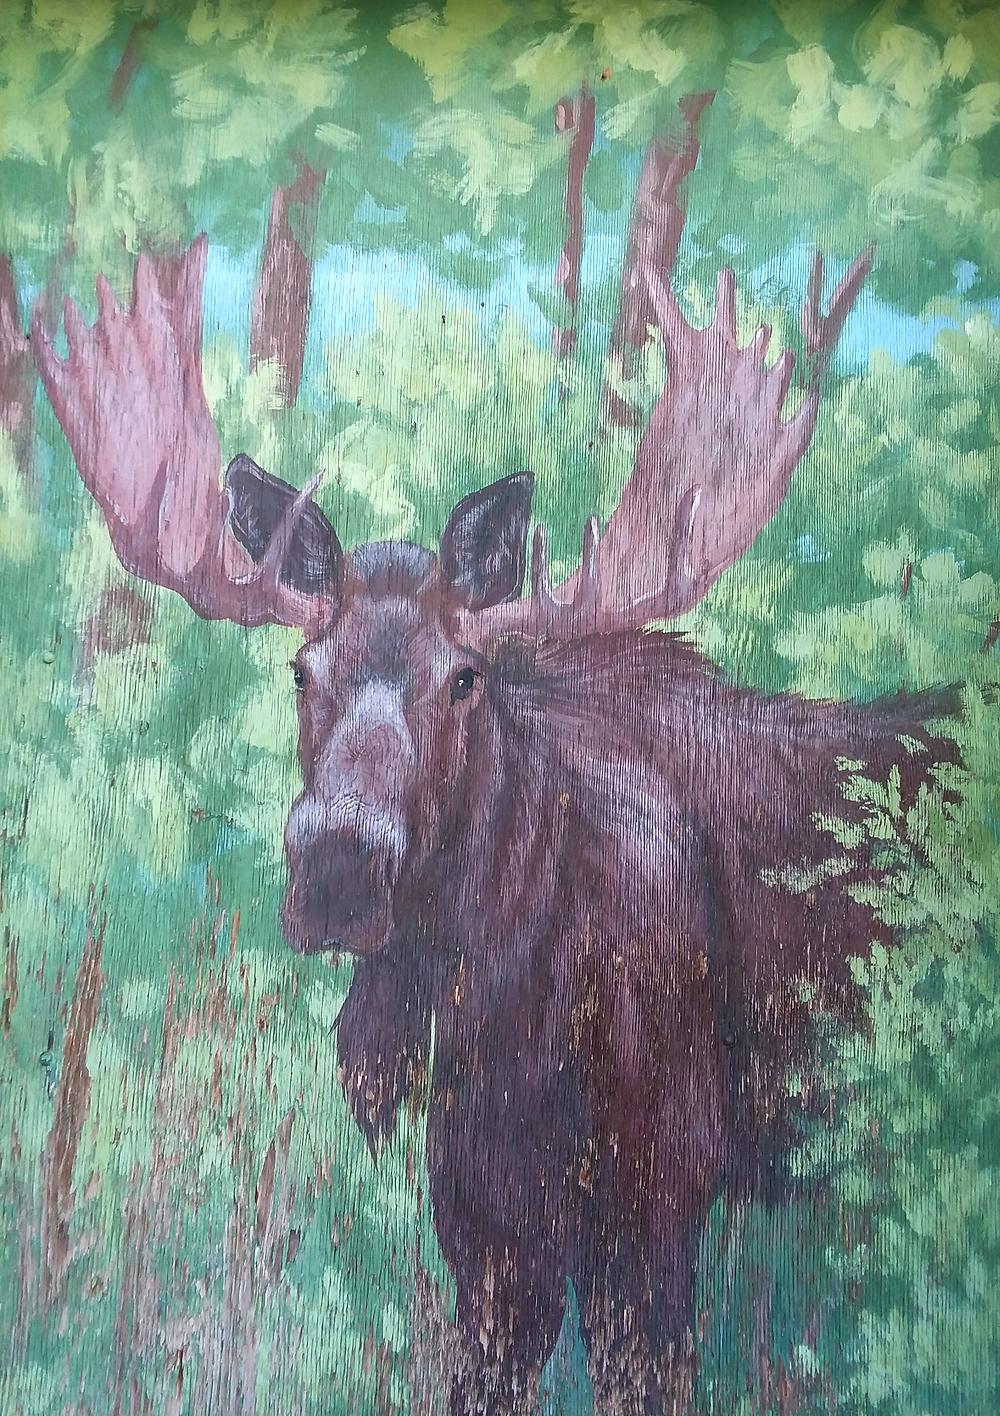 Moose street art in Jackson, Wyoming